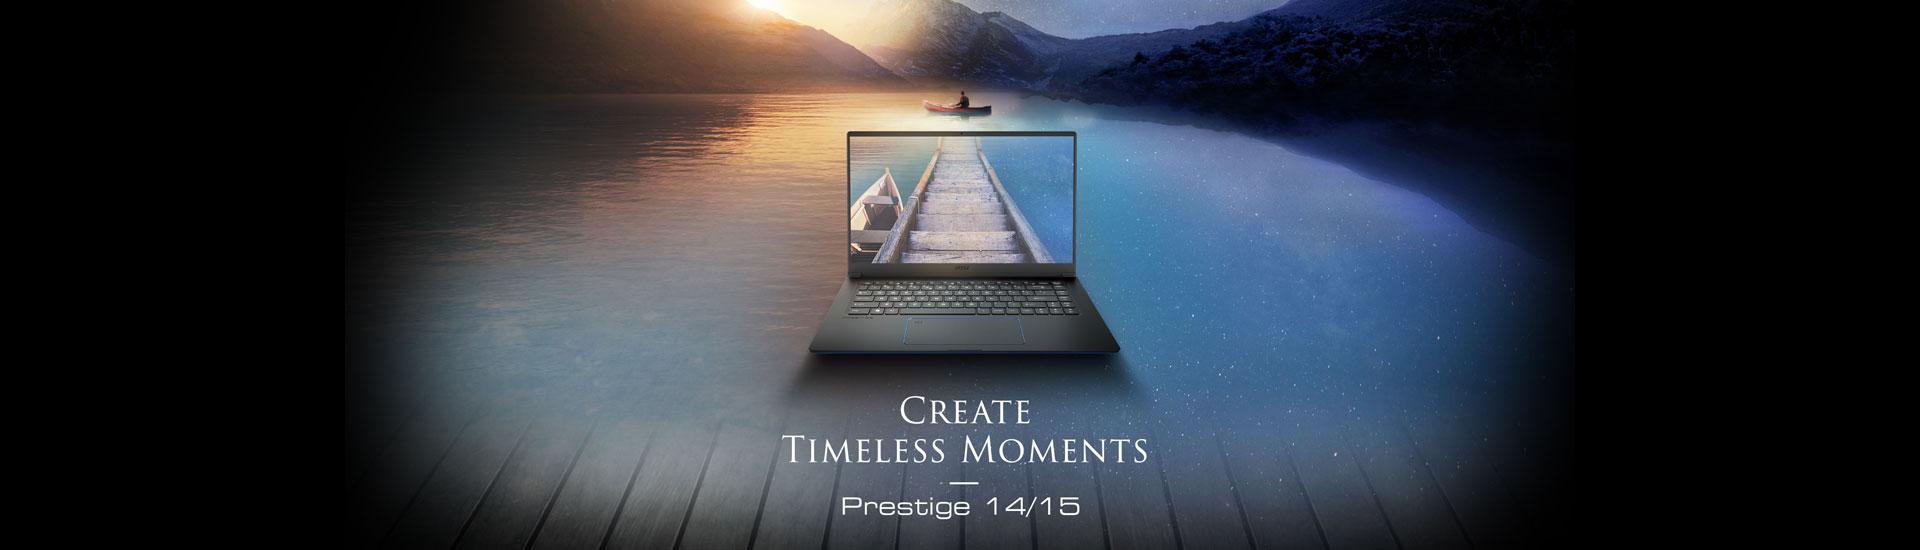 Prestige Series